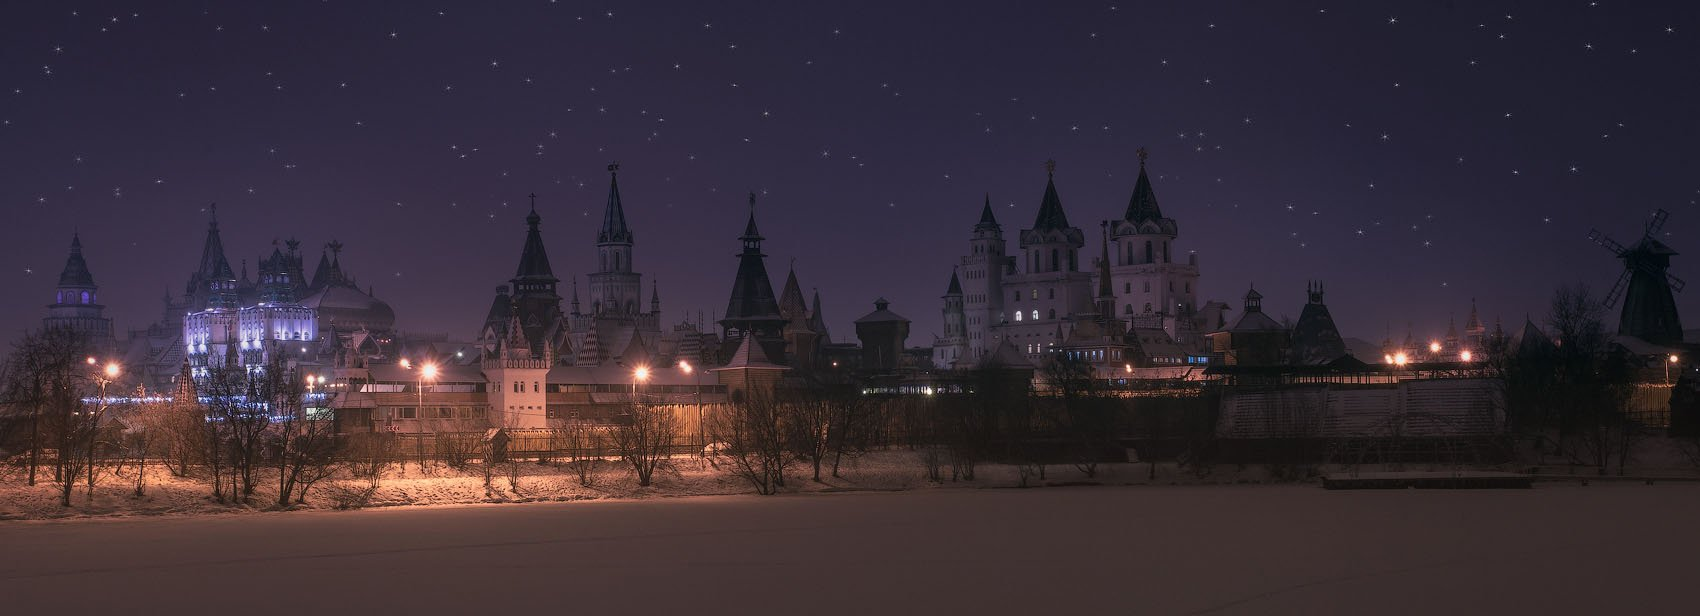 Январь, Москва, Измайлово, Вечер, Андрей Леонидович